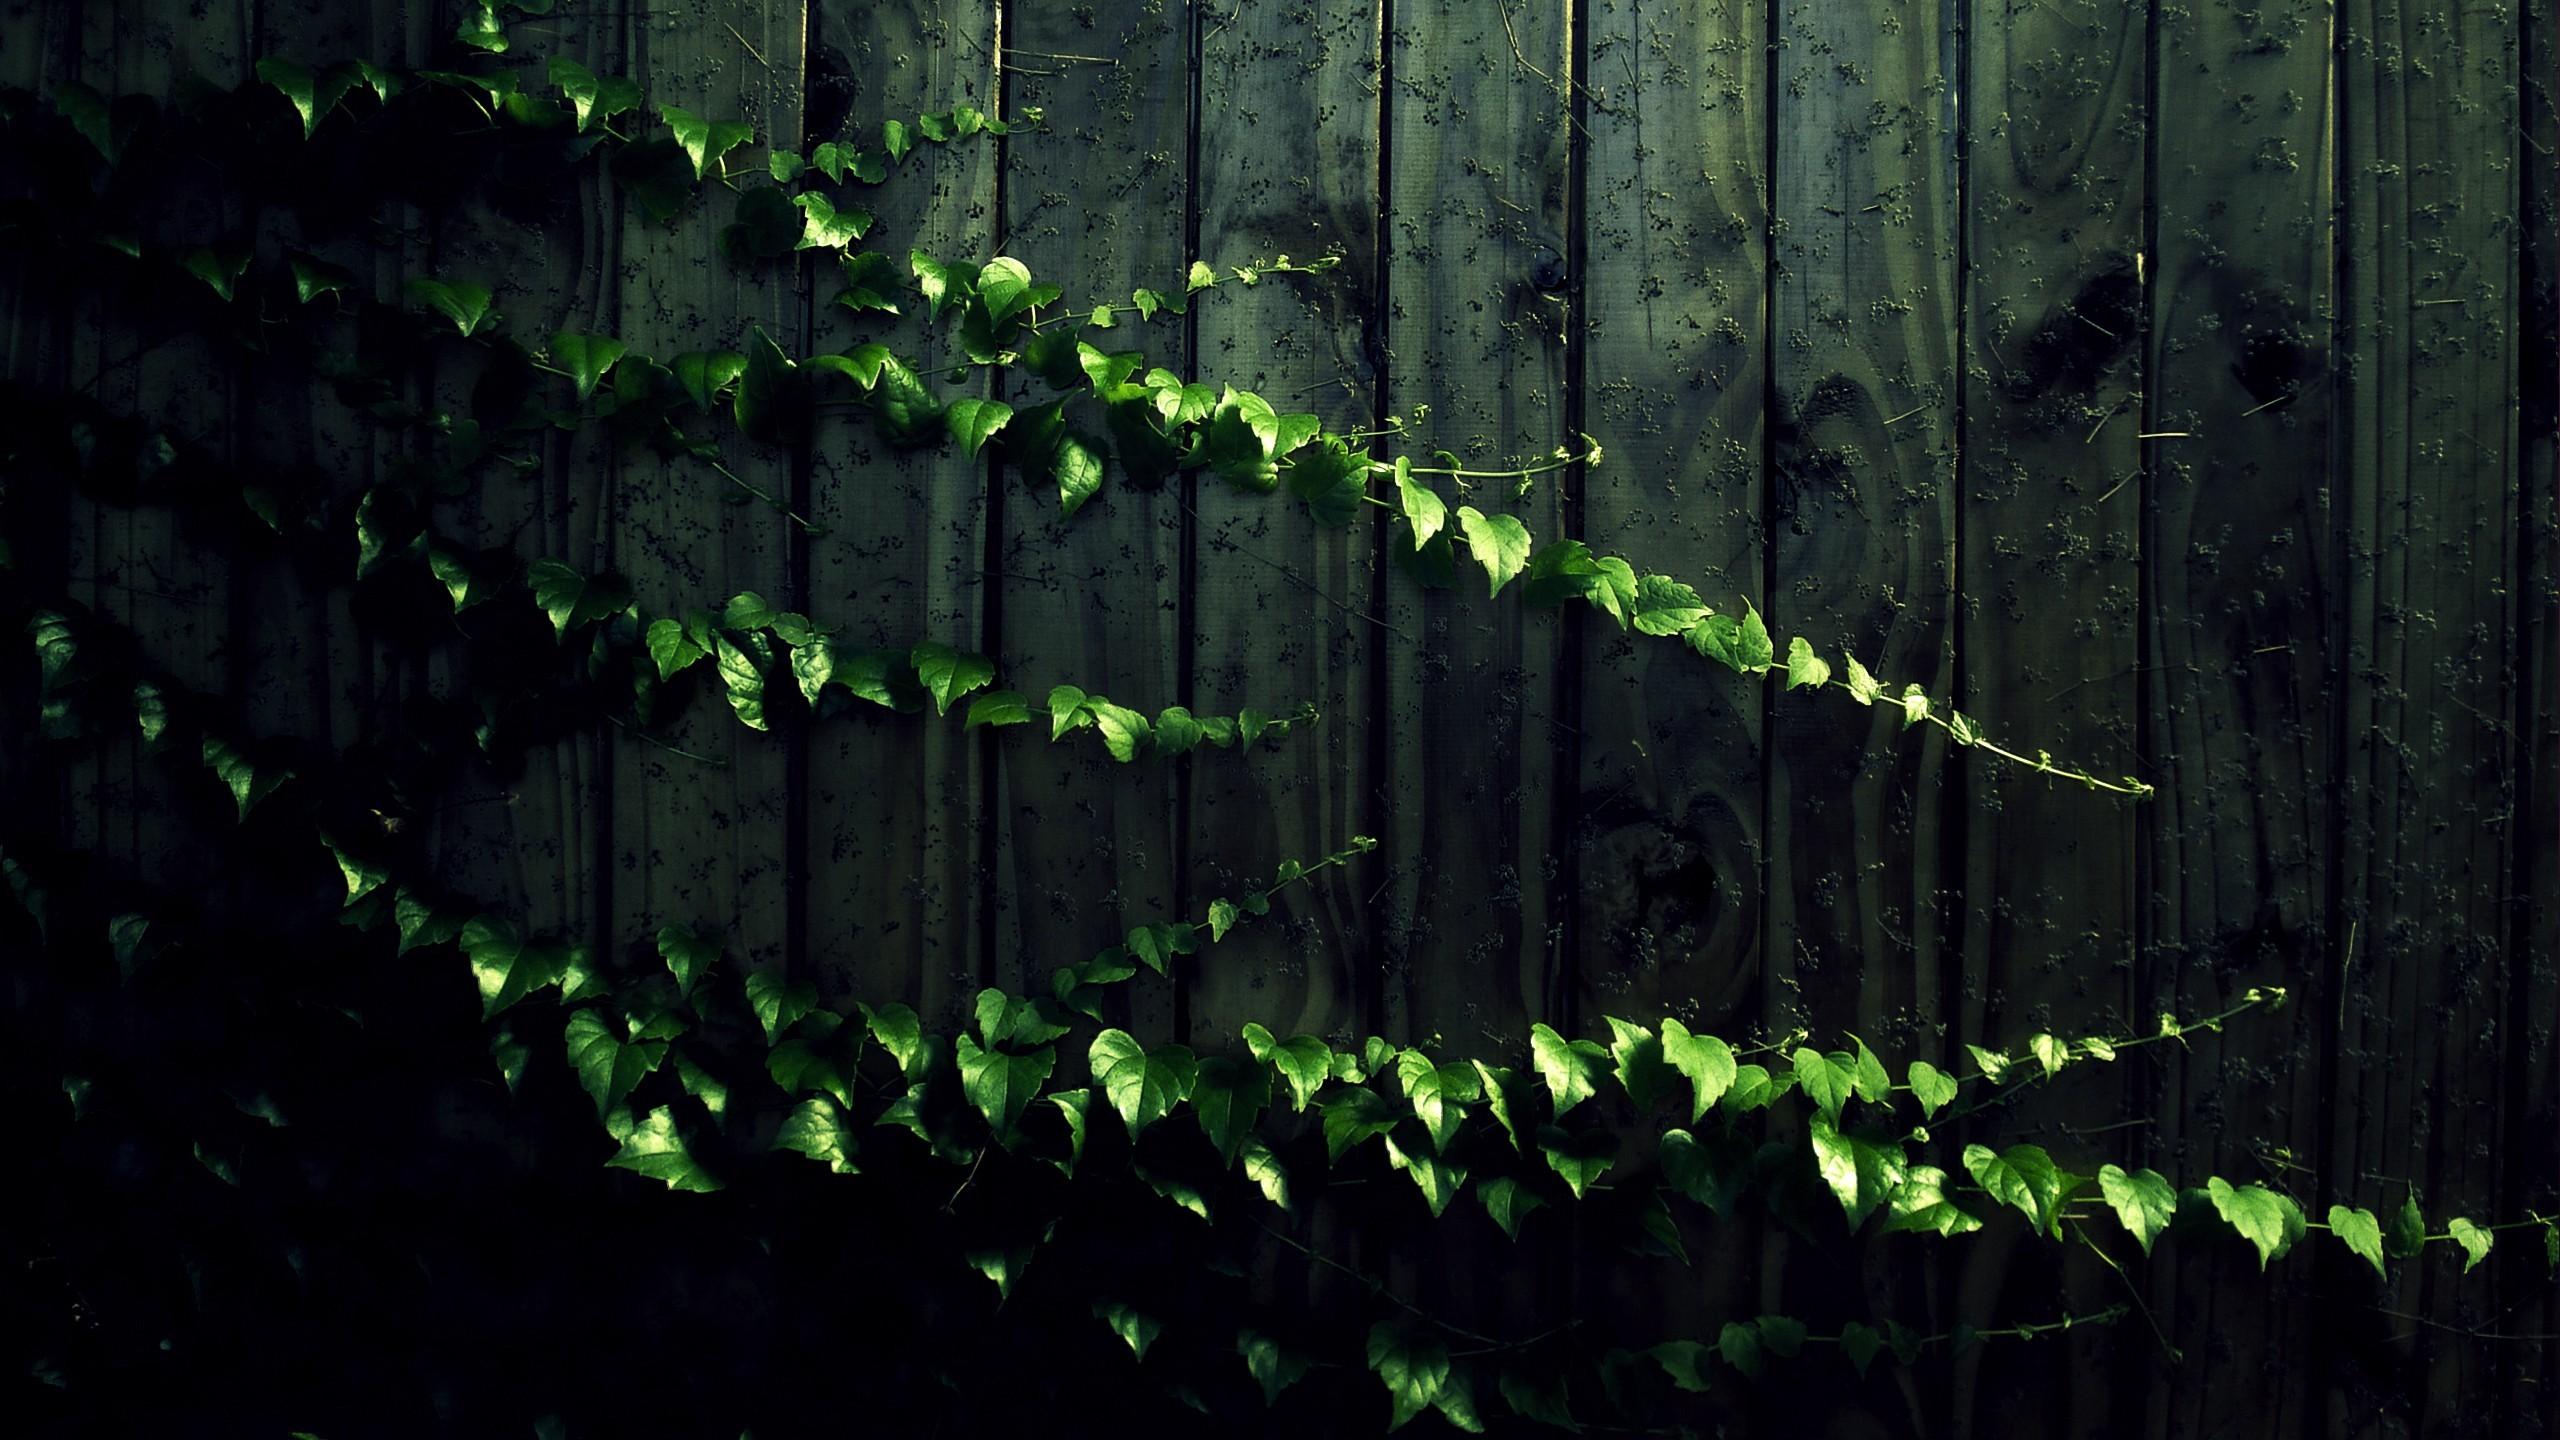 Landscape Images Nature Backgrounds Leaveswood Vines 2560x1440